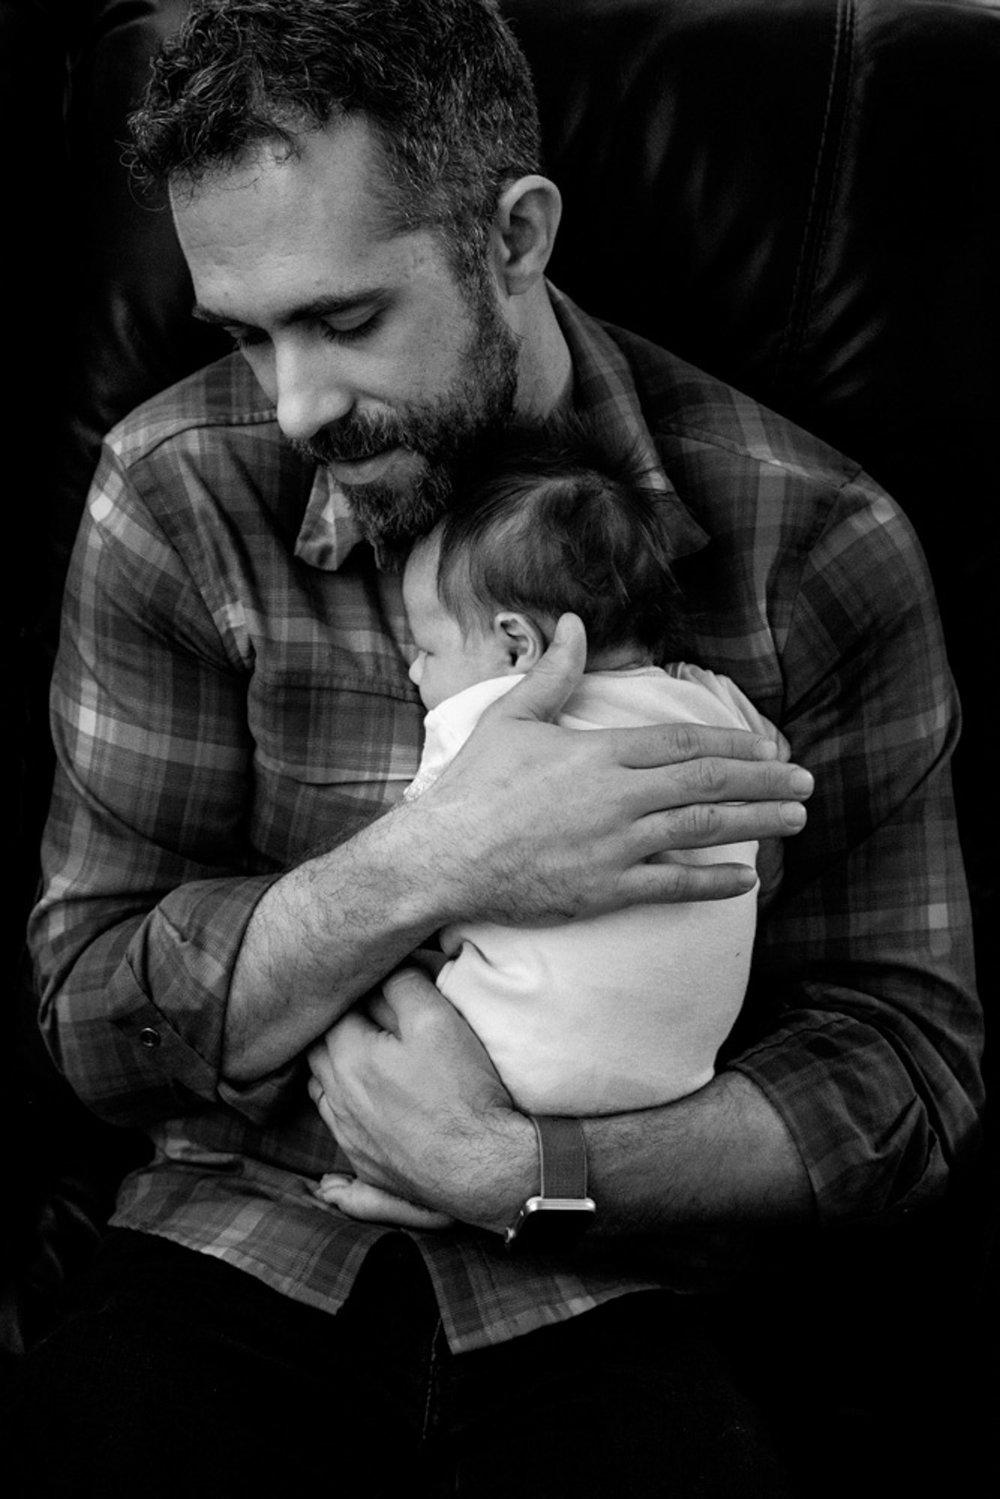 dad in chair snuggling a newborn baby